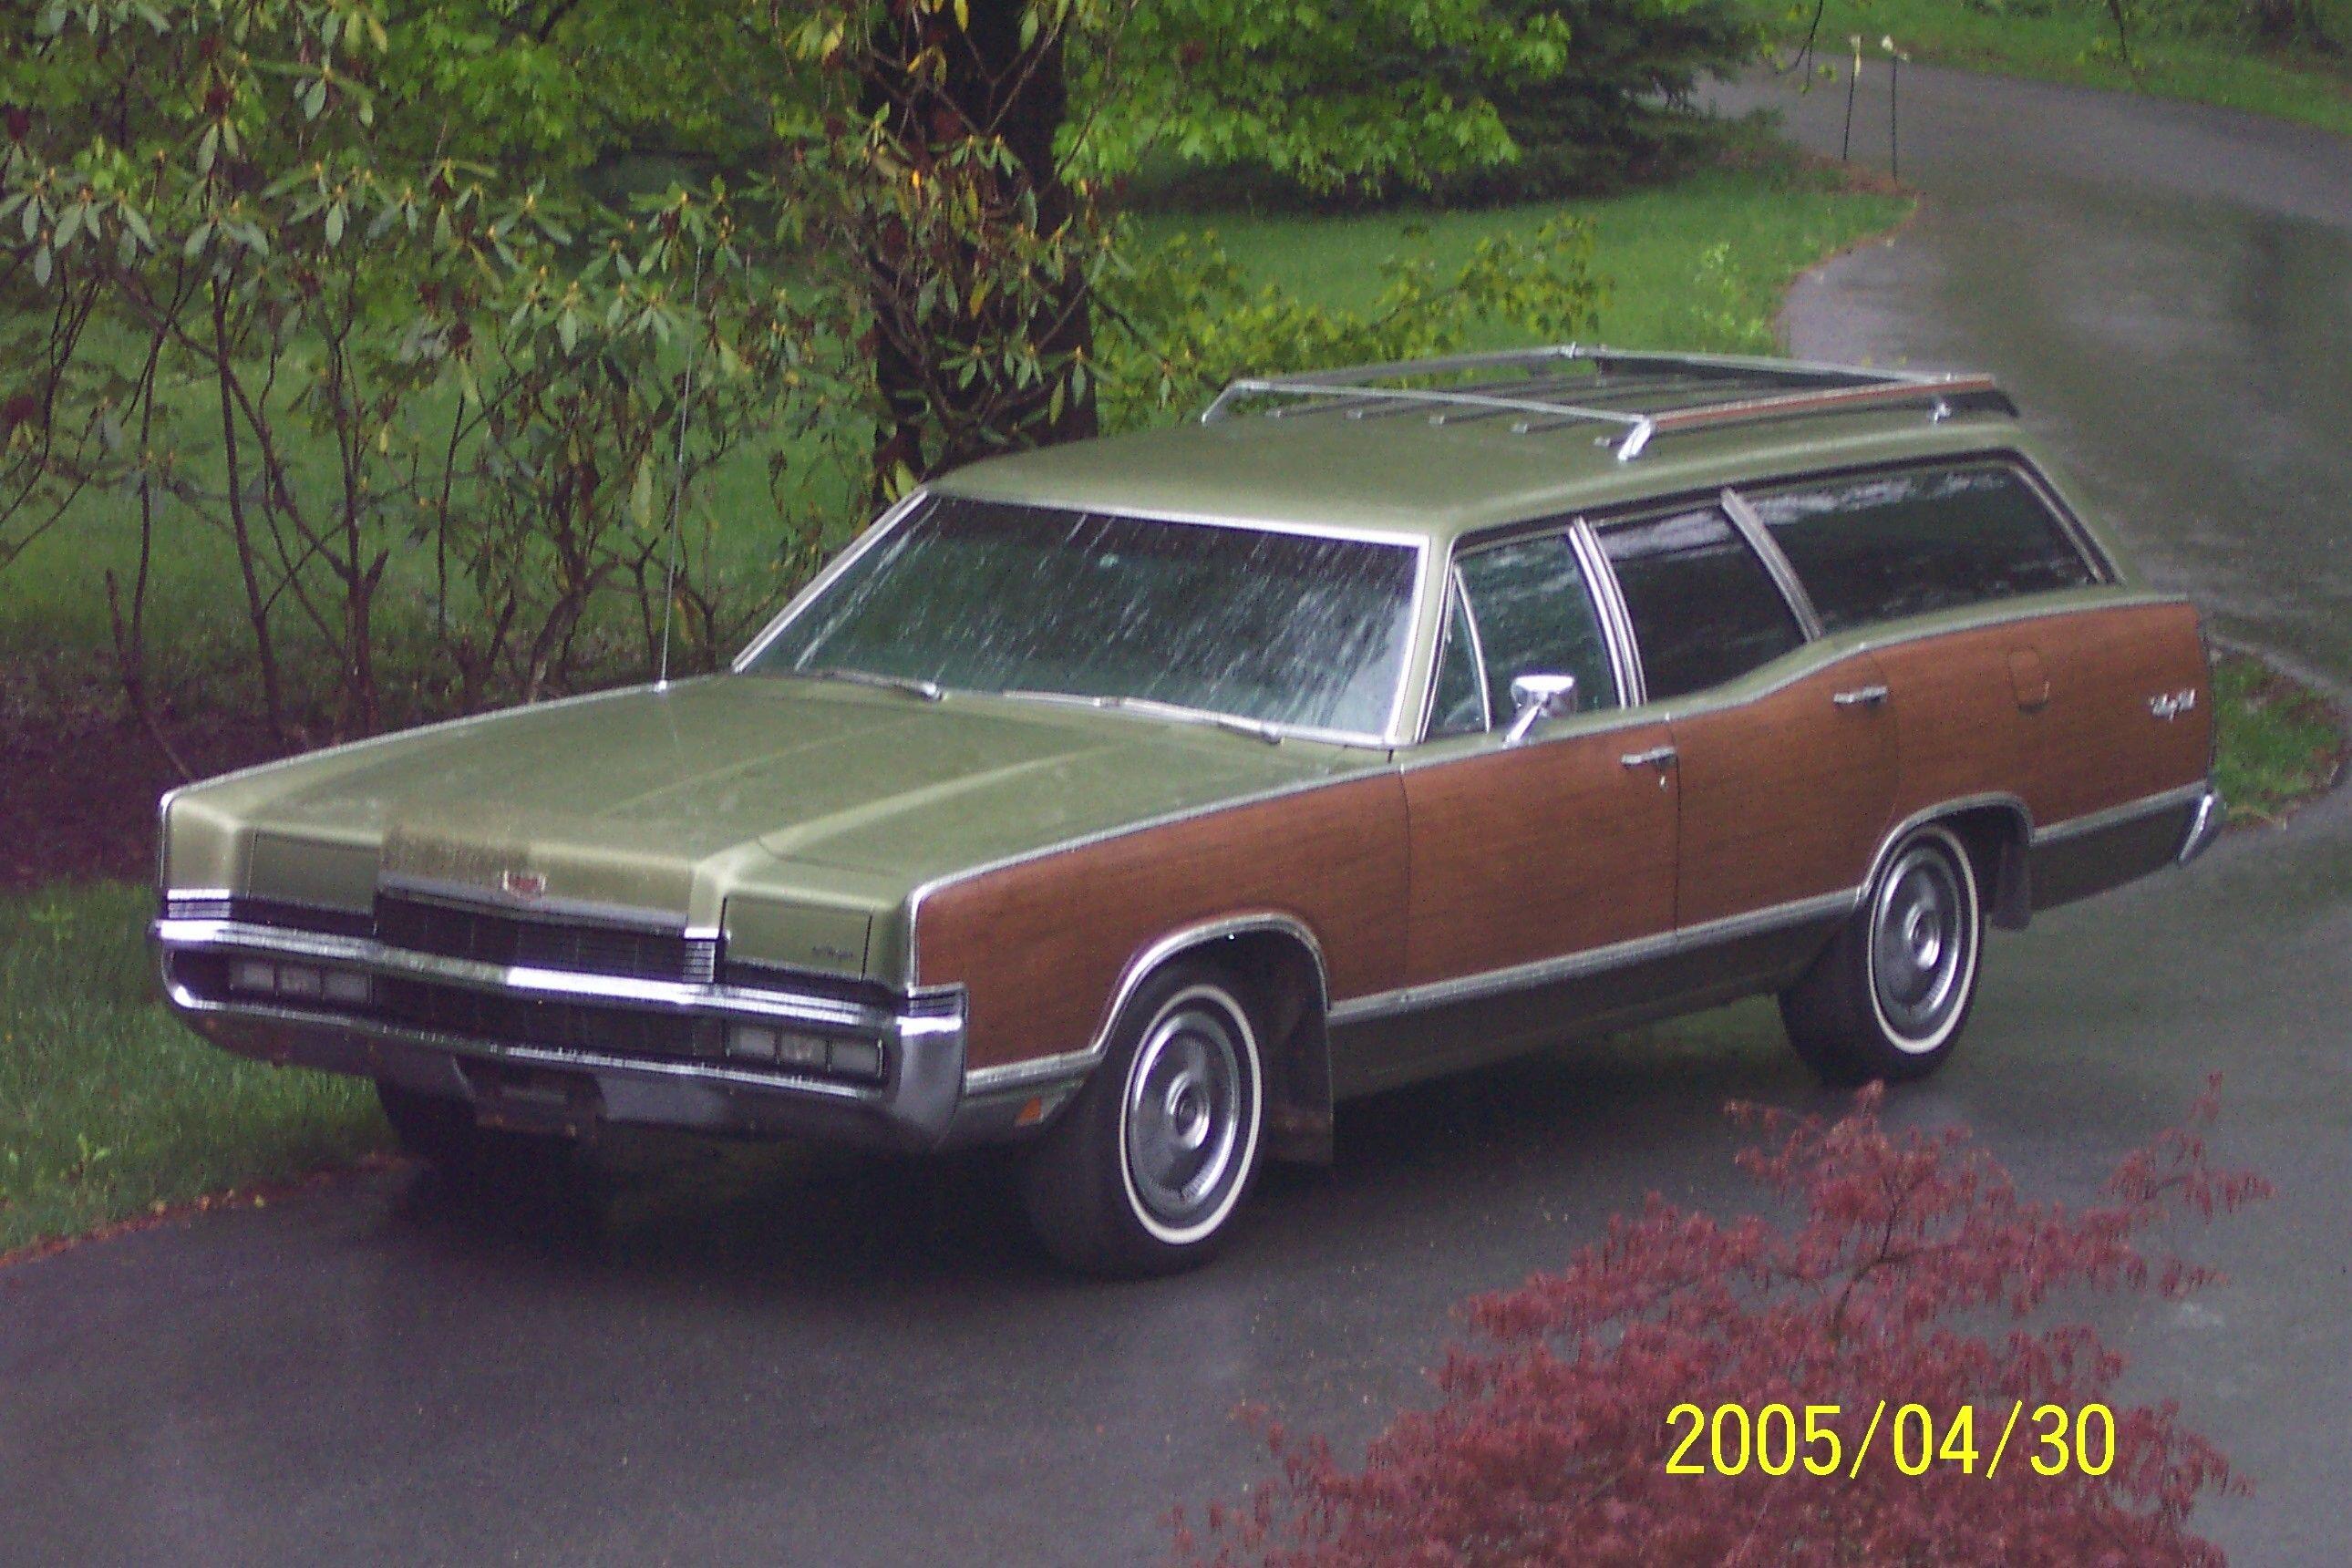 1970 Chevrolet Chevelle station wagon